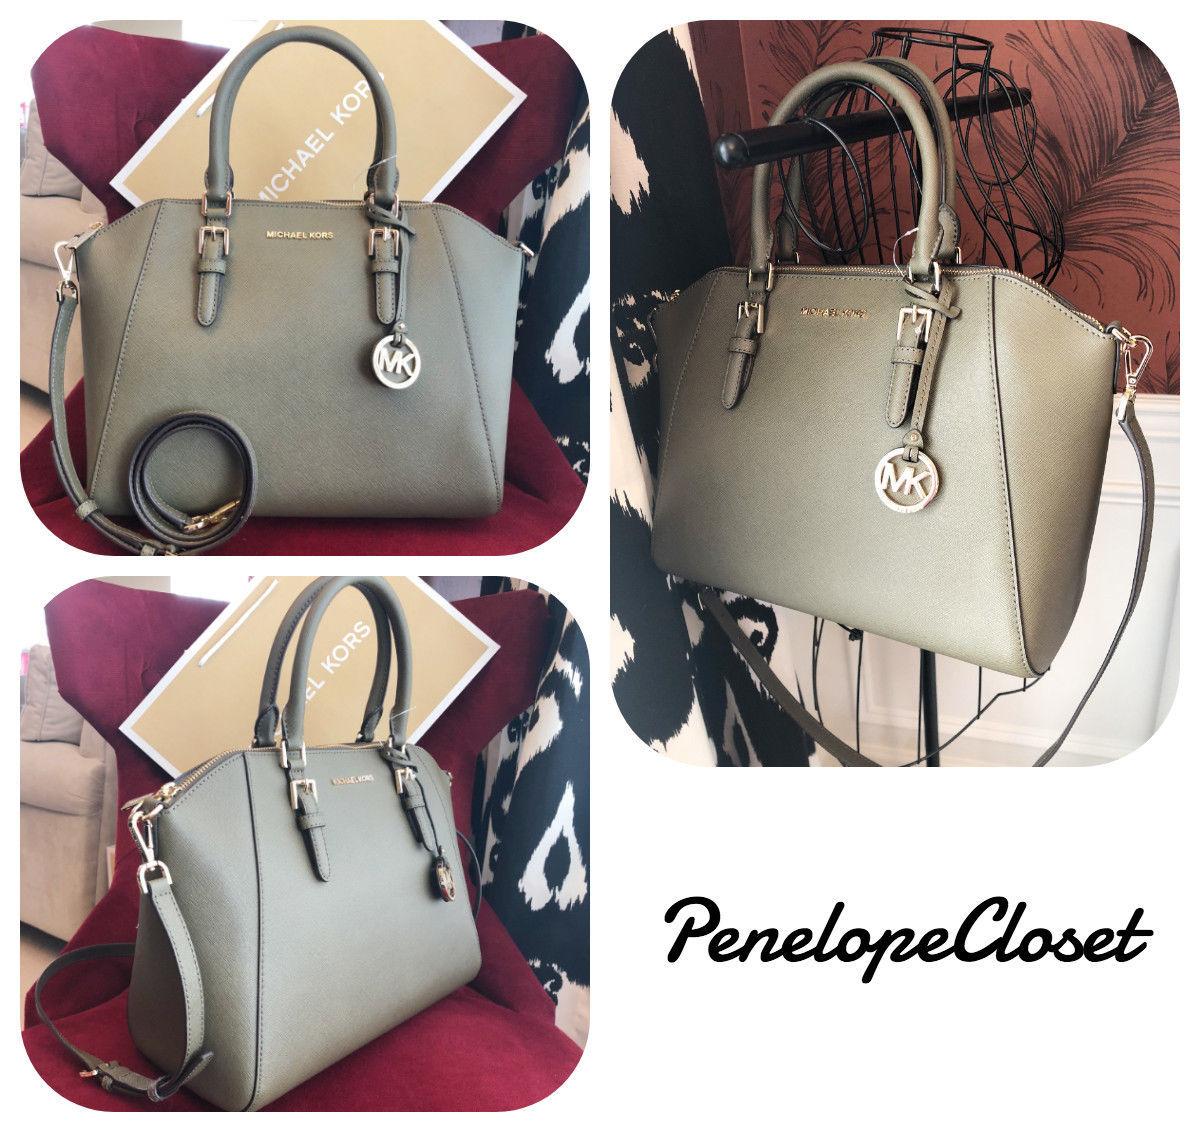 b71eb38b39413 Nwt Michael Kors Saffiano Leather Ciara and 50 similar items. S l1600